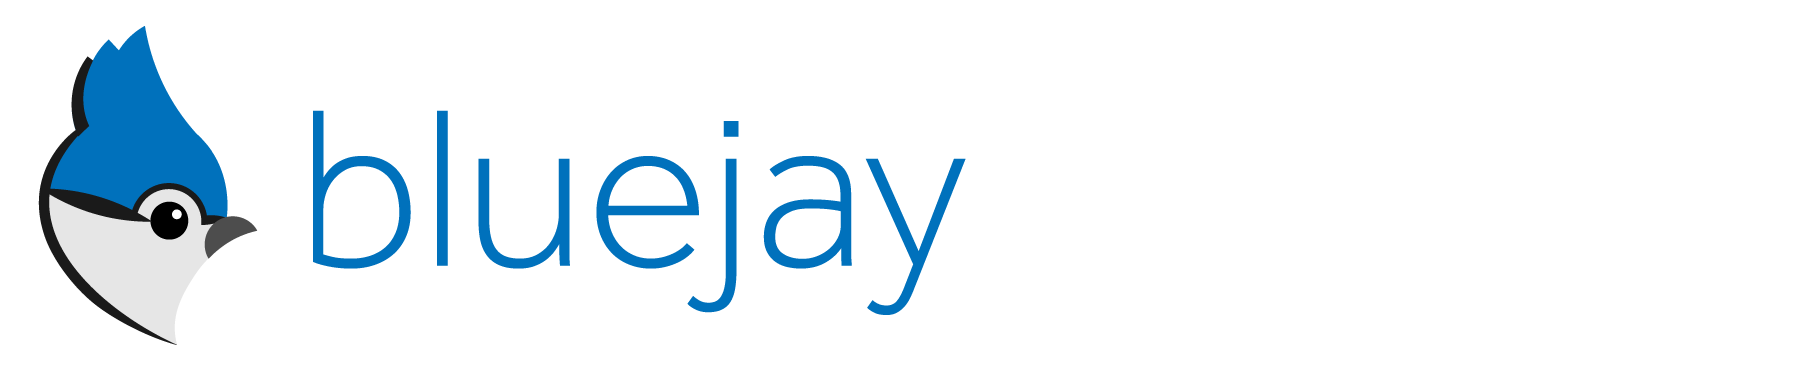 GitHub - steamclock/bluejay: A simple Swift framework for